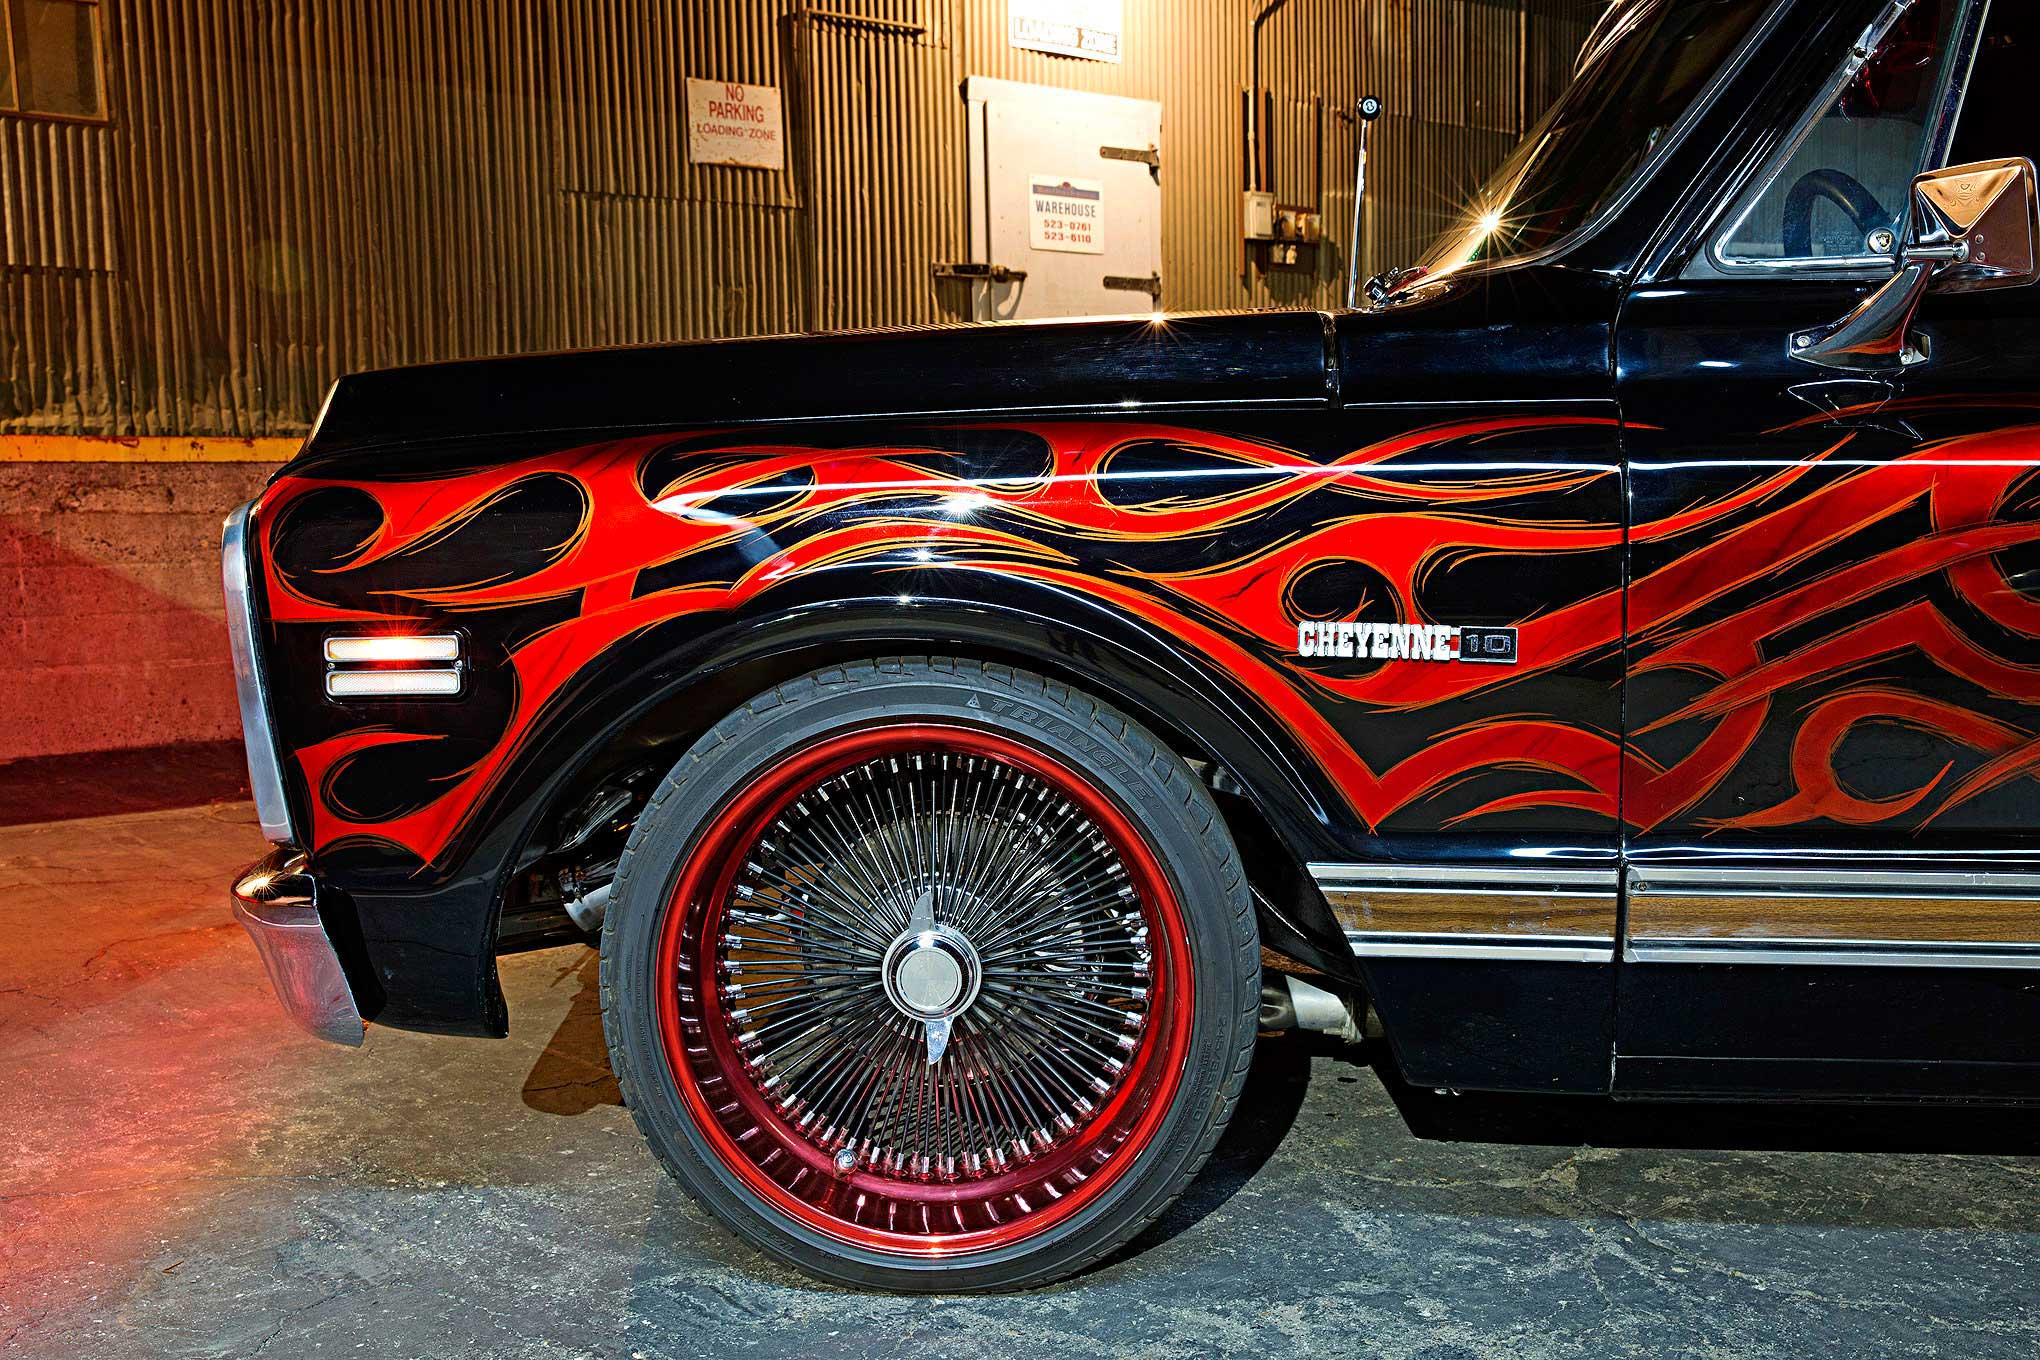 Al Corona's 1972 Chevy Cheyenne - Skanless 72